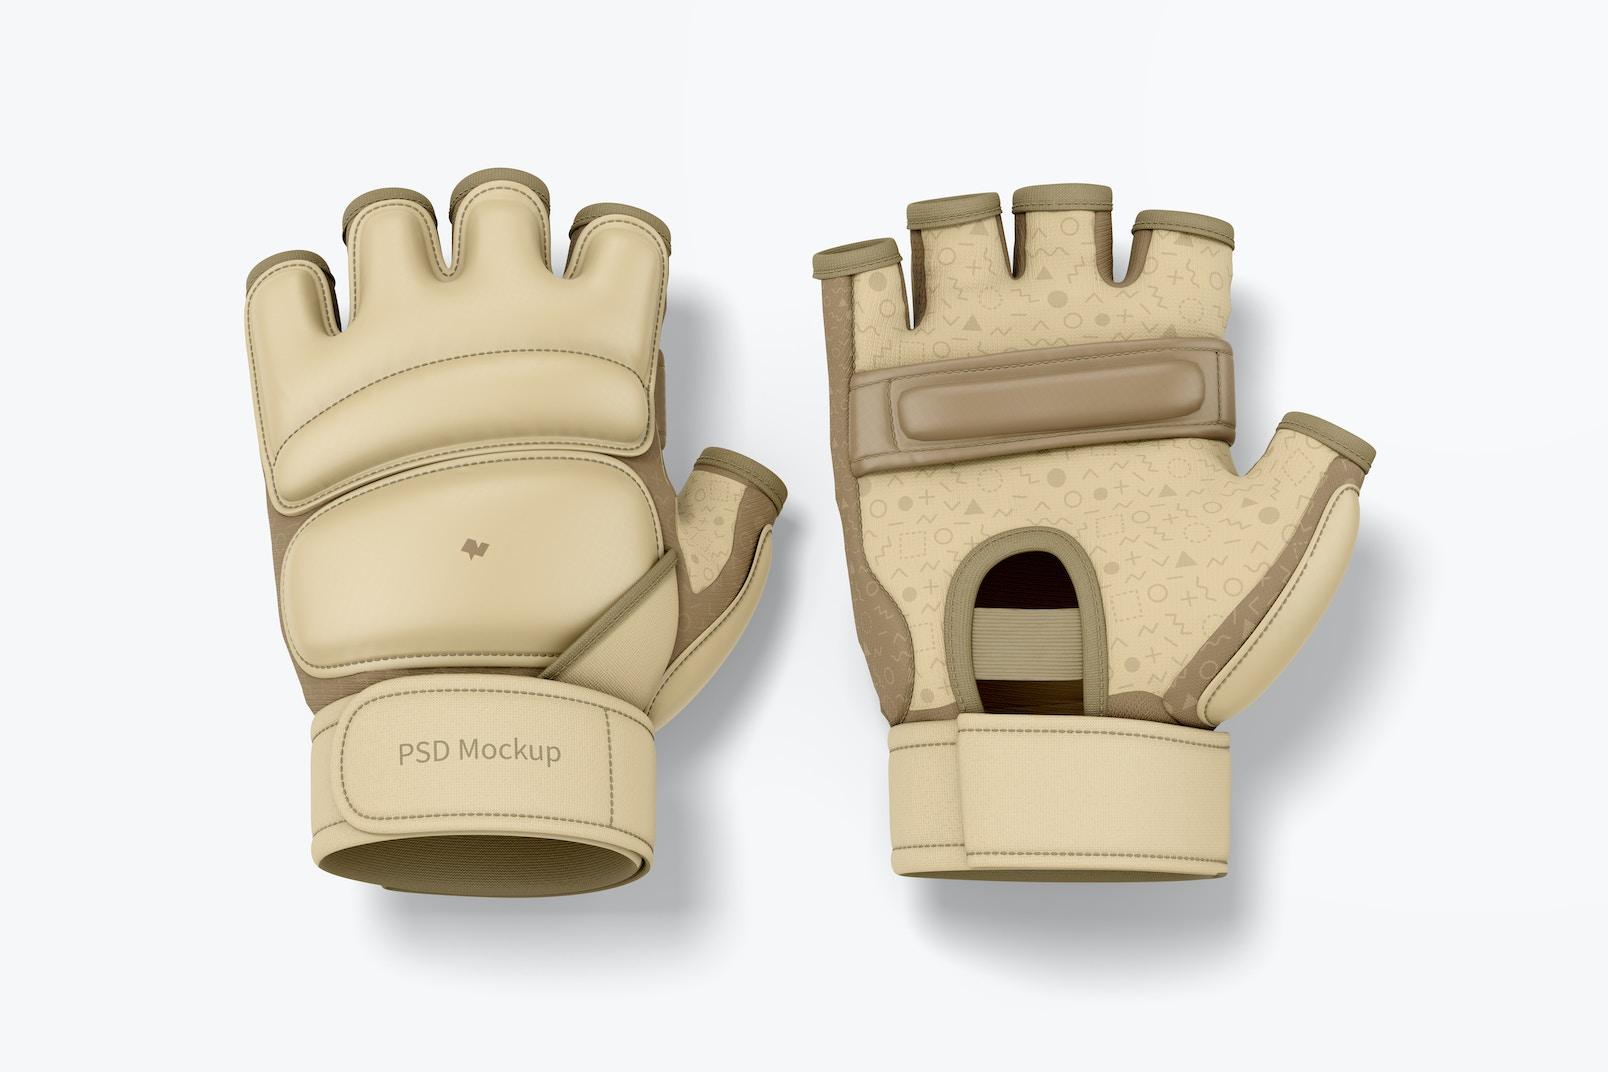 Taekwondo Gloves Mockup, Top View